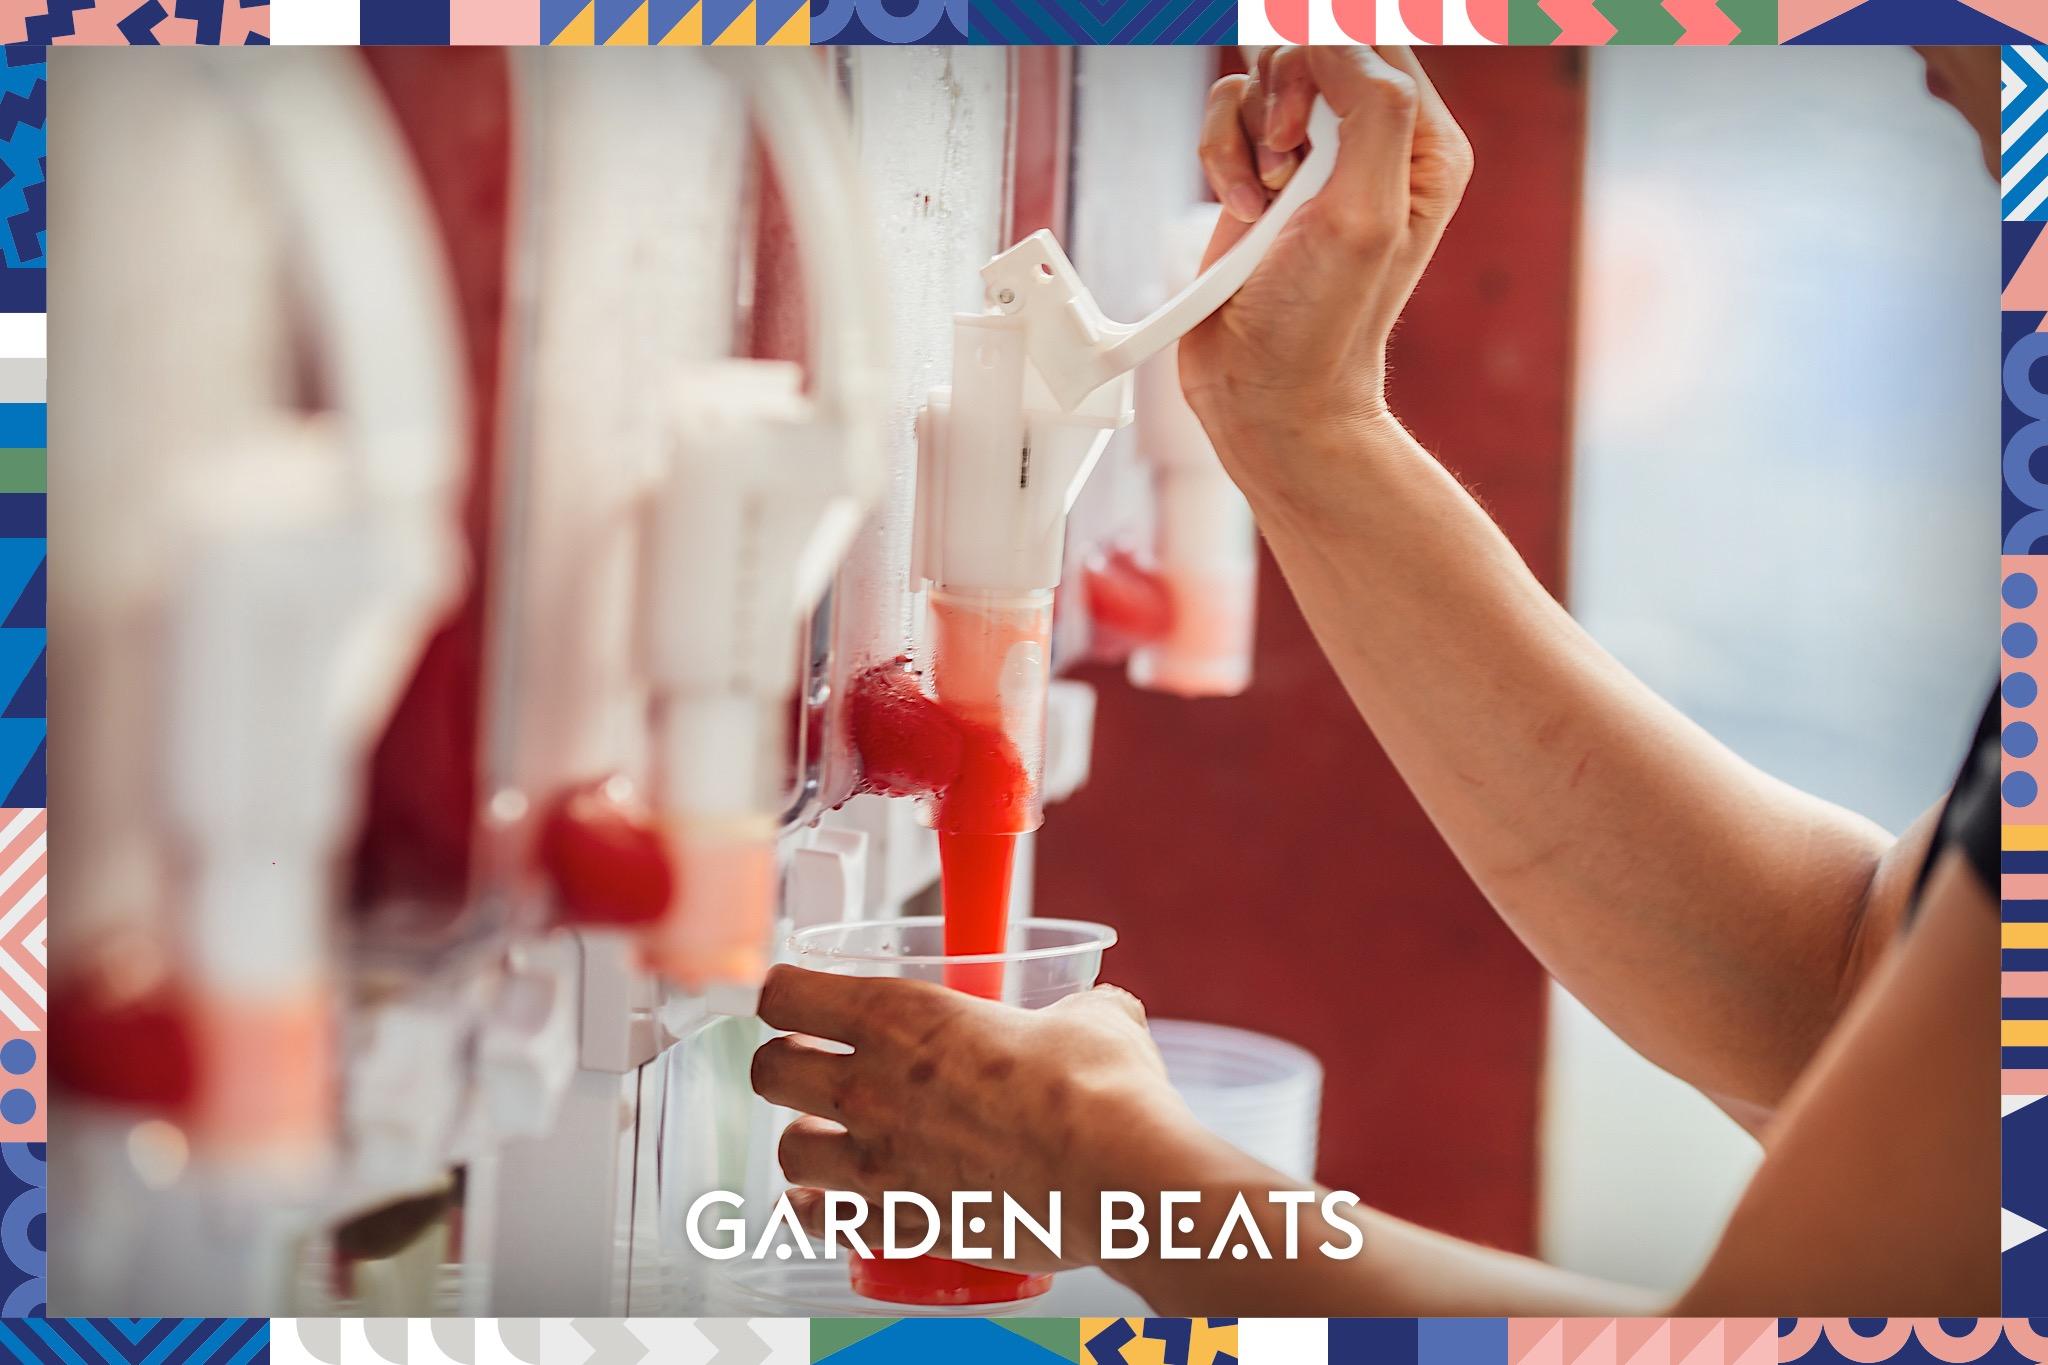 18032017_GardenBeats_Colossal558_WatermarkedGB.jpg